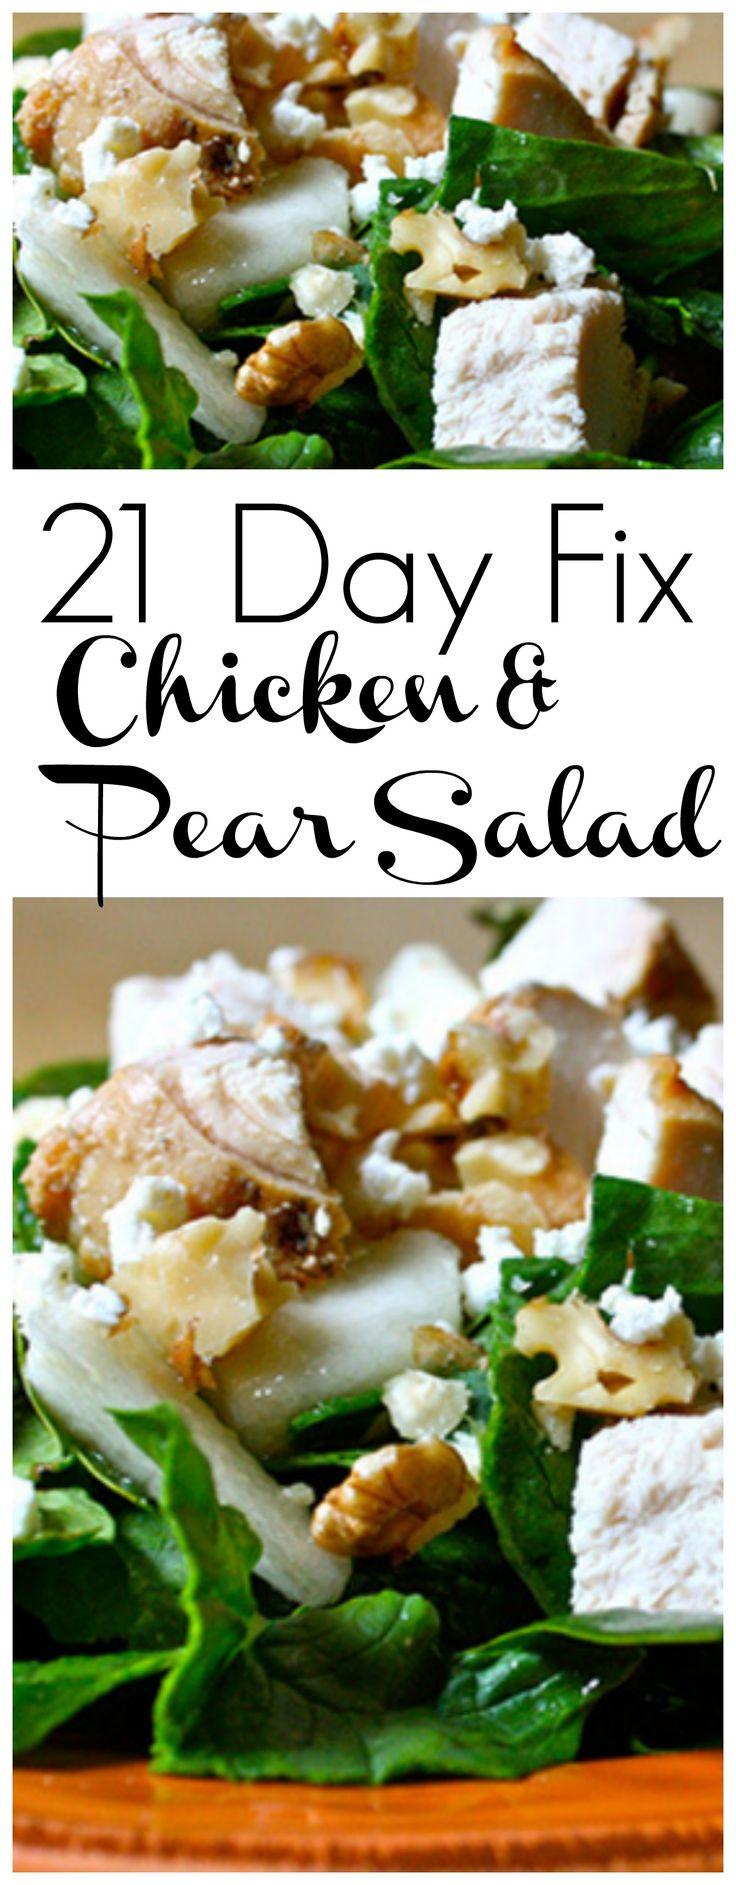 21 Day Fix Chicken and Pear Salad #21dfx #21dayfix #21dayfixsalad…